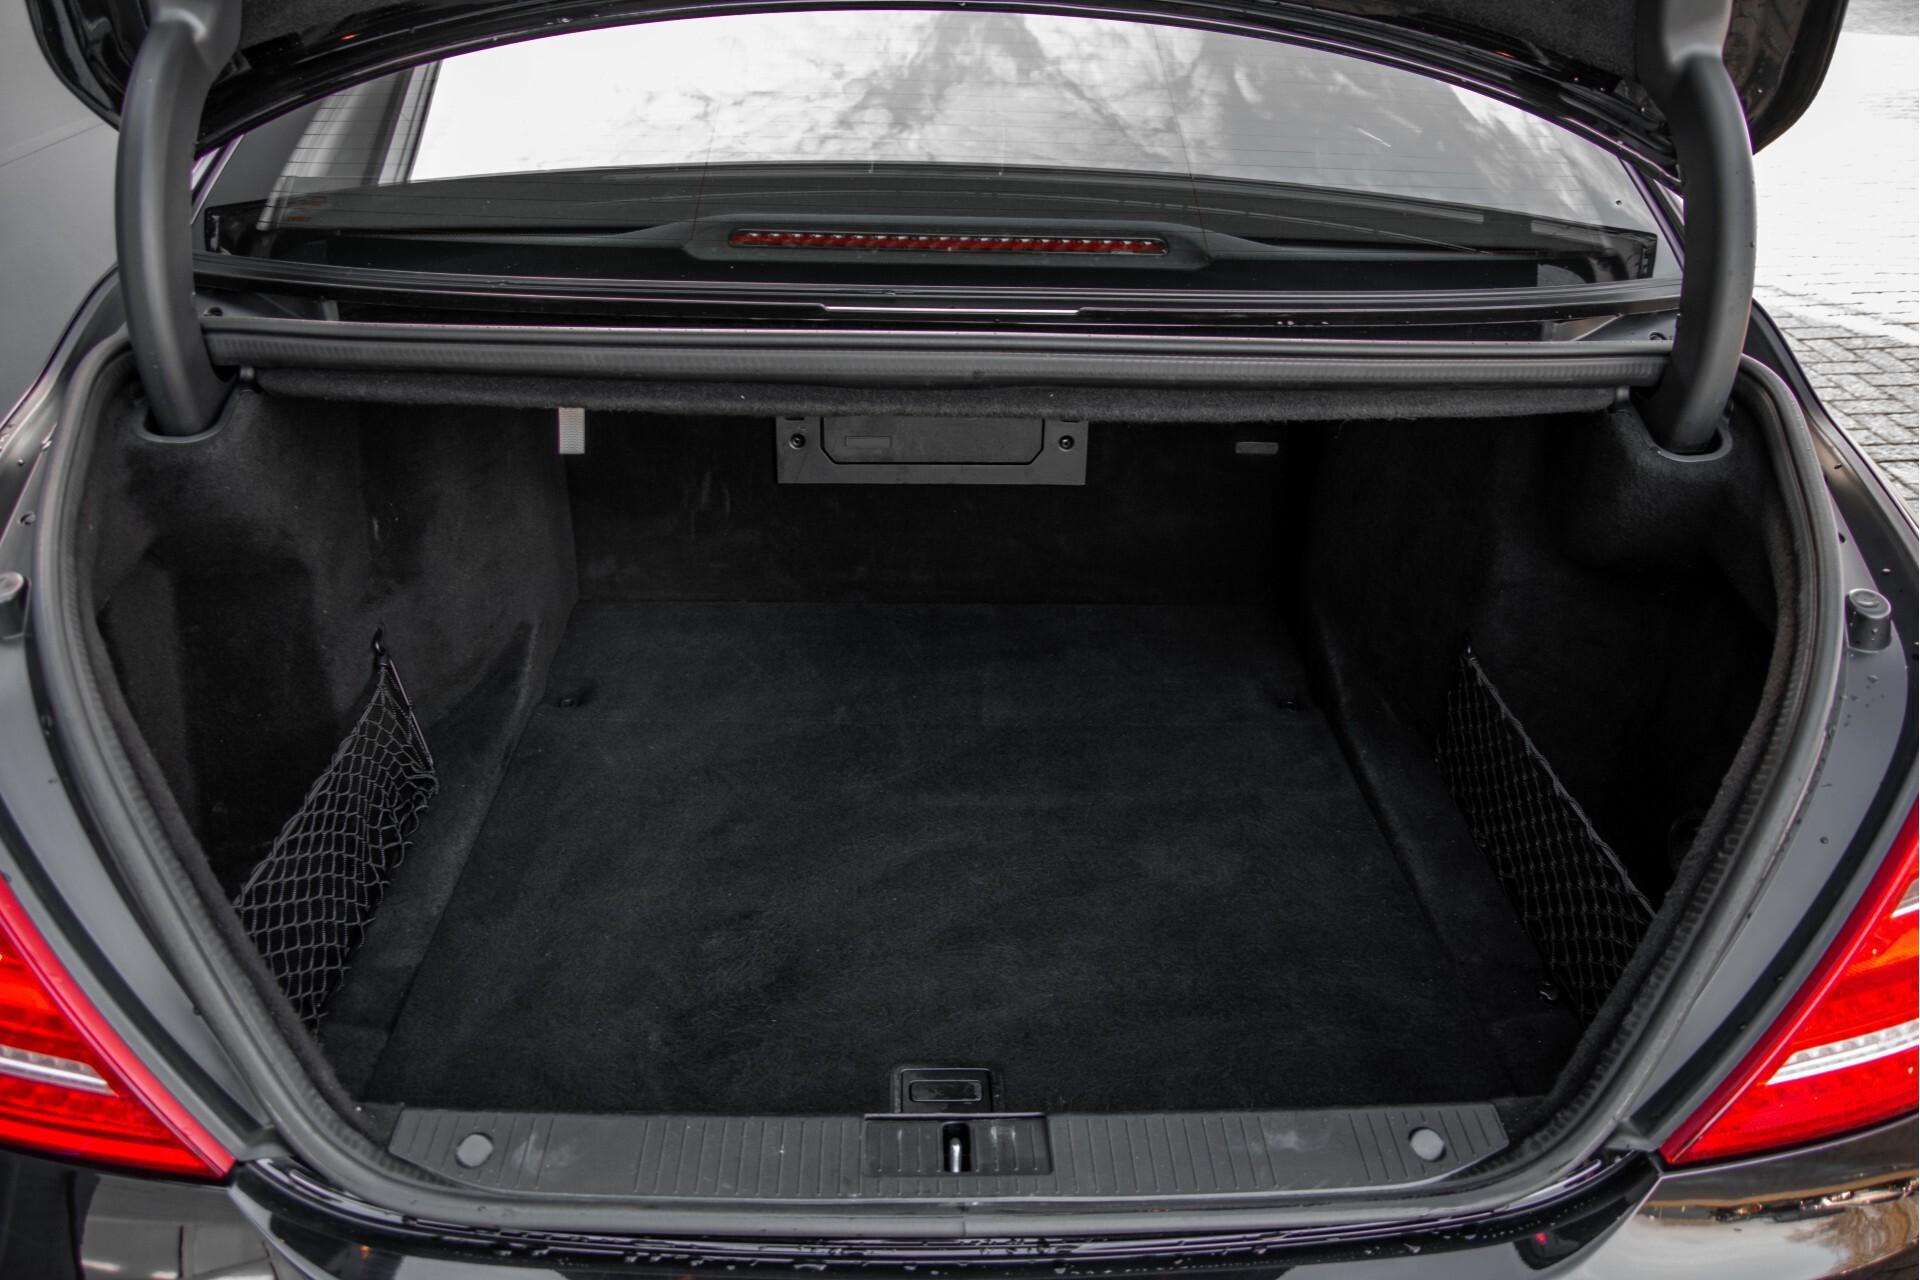 Mercedes-Benz S-Klasse 350 Bluetec Keyless/Distronic/Nightvision/Schuifdak/Harman-Kardon Aut7 Foto 64